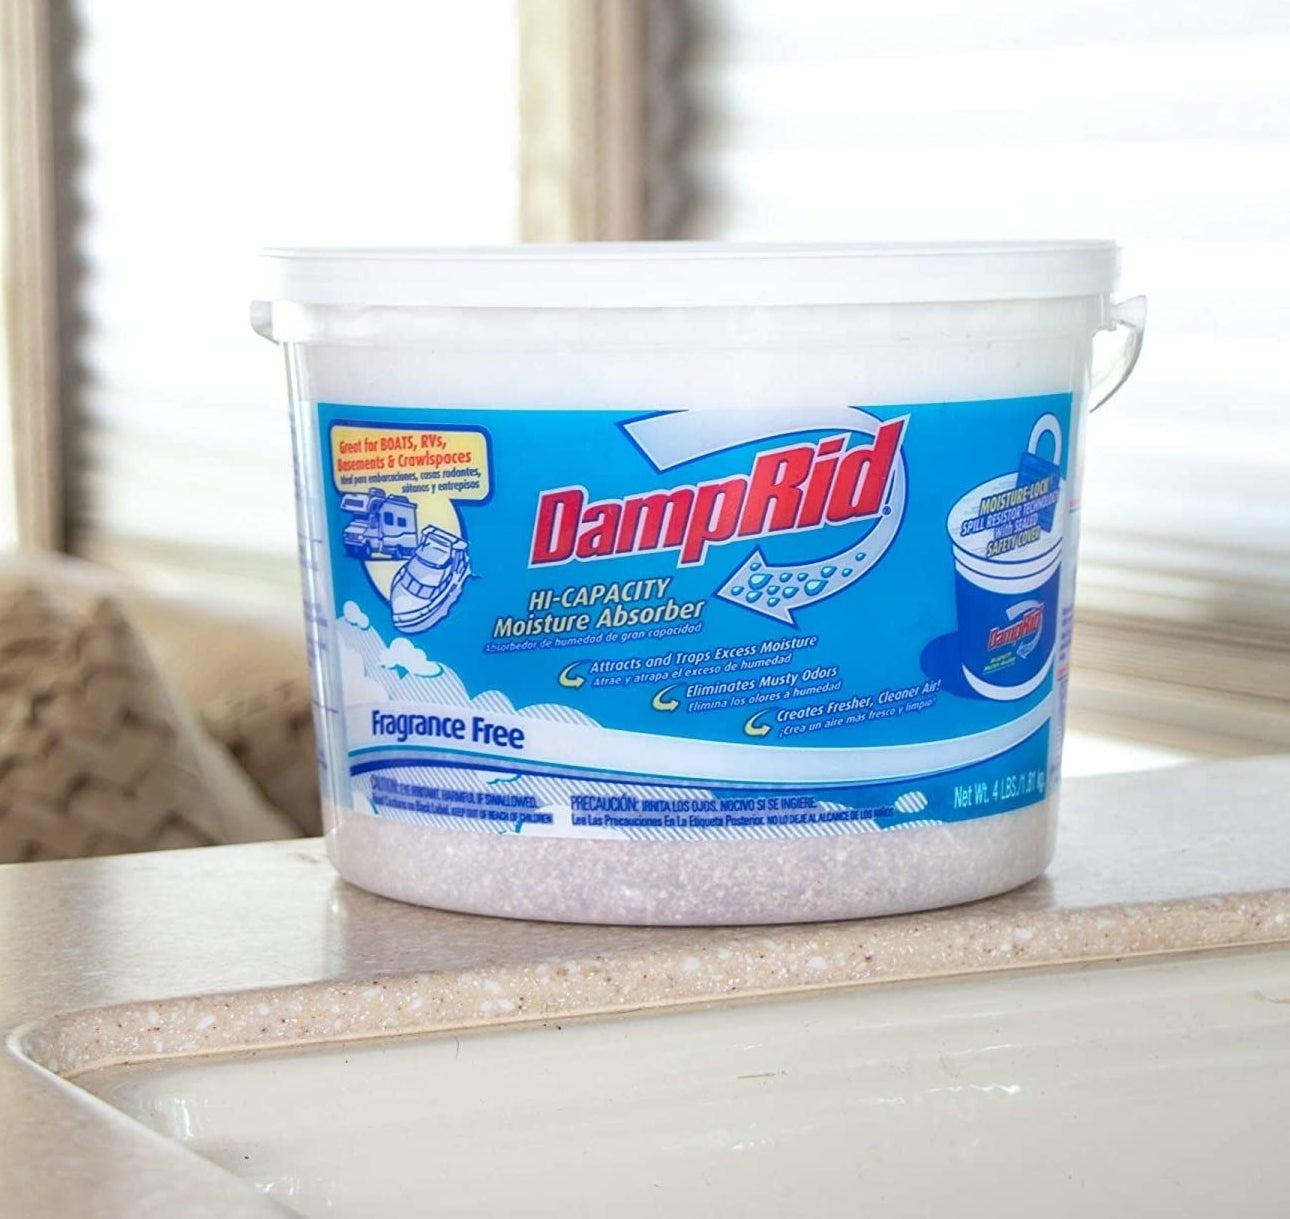 The bucket of high capacity moisture absorber